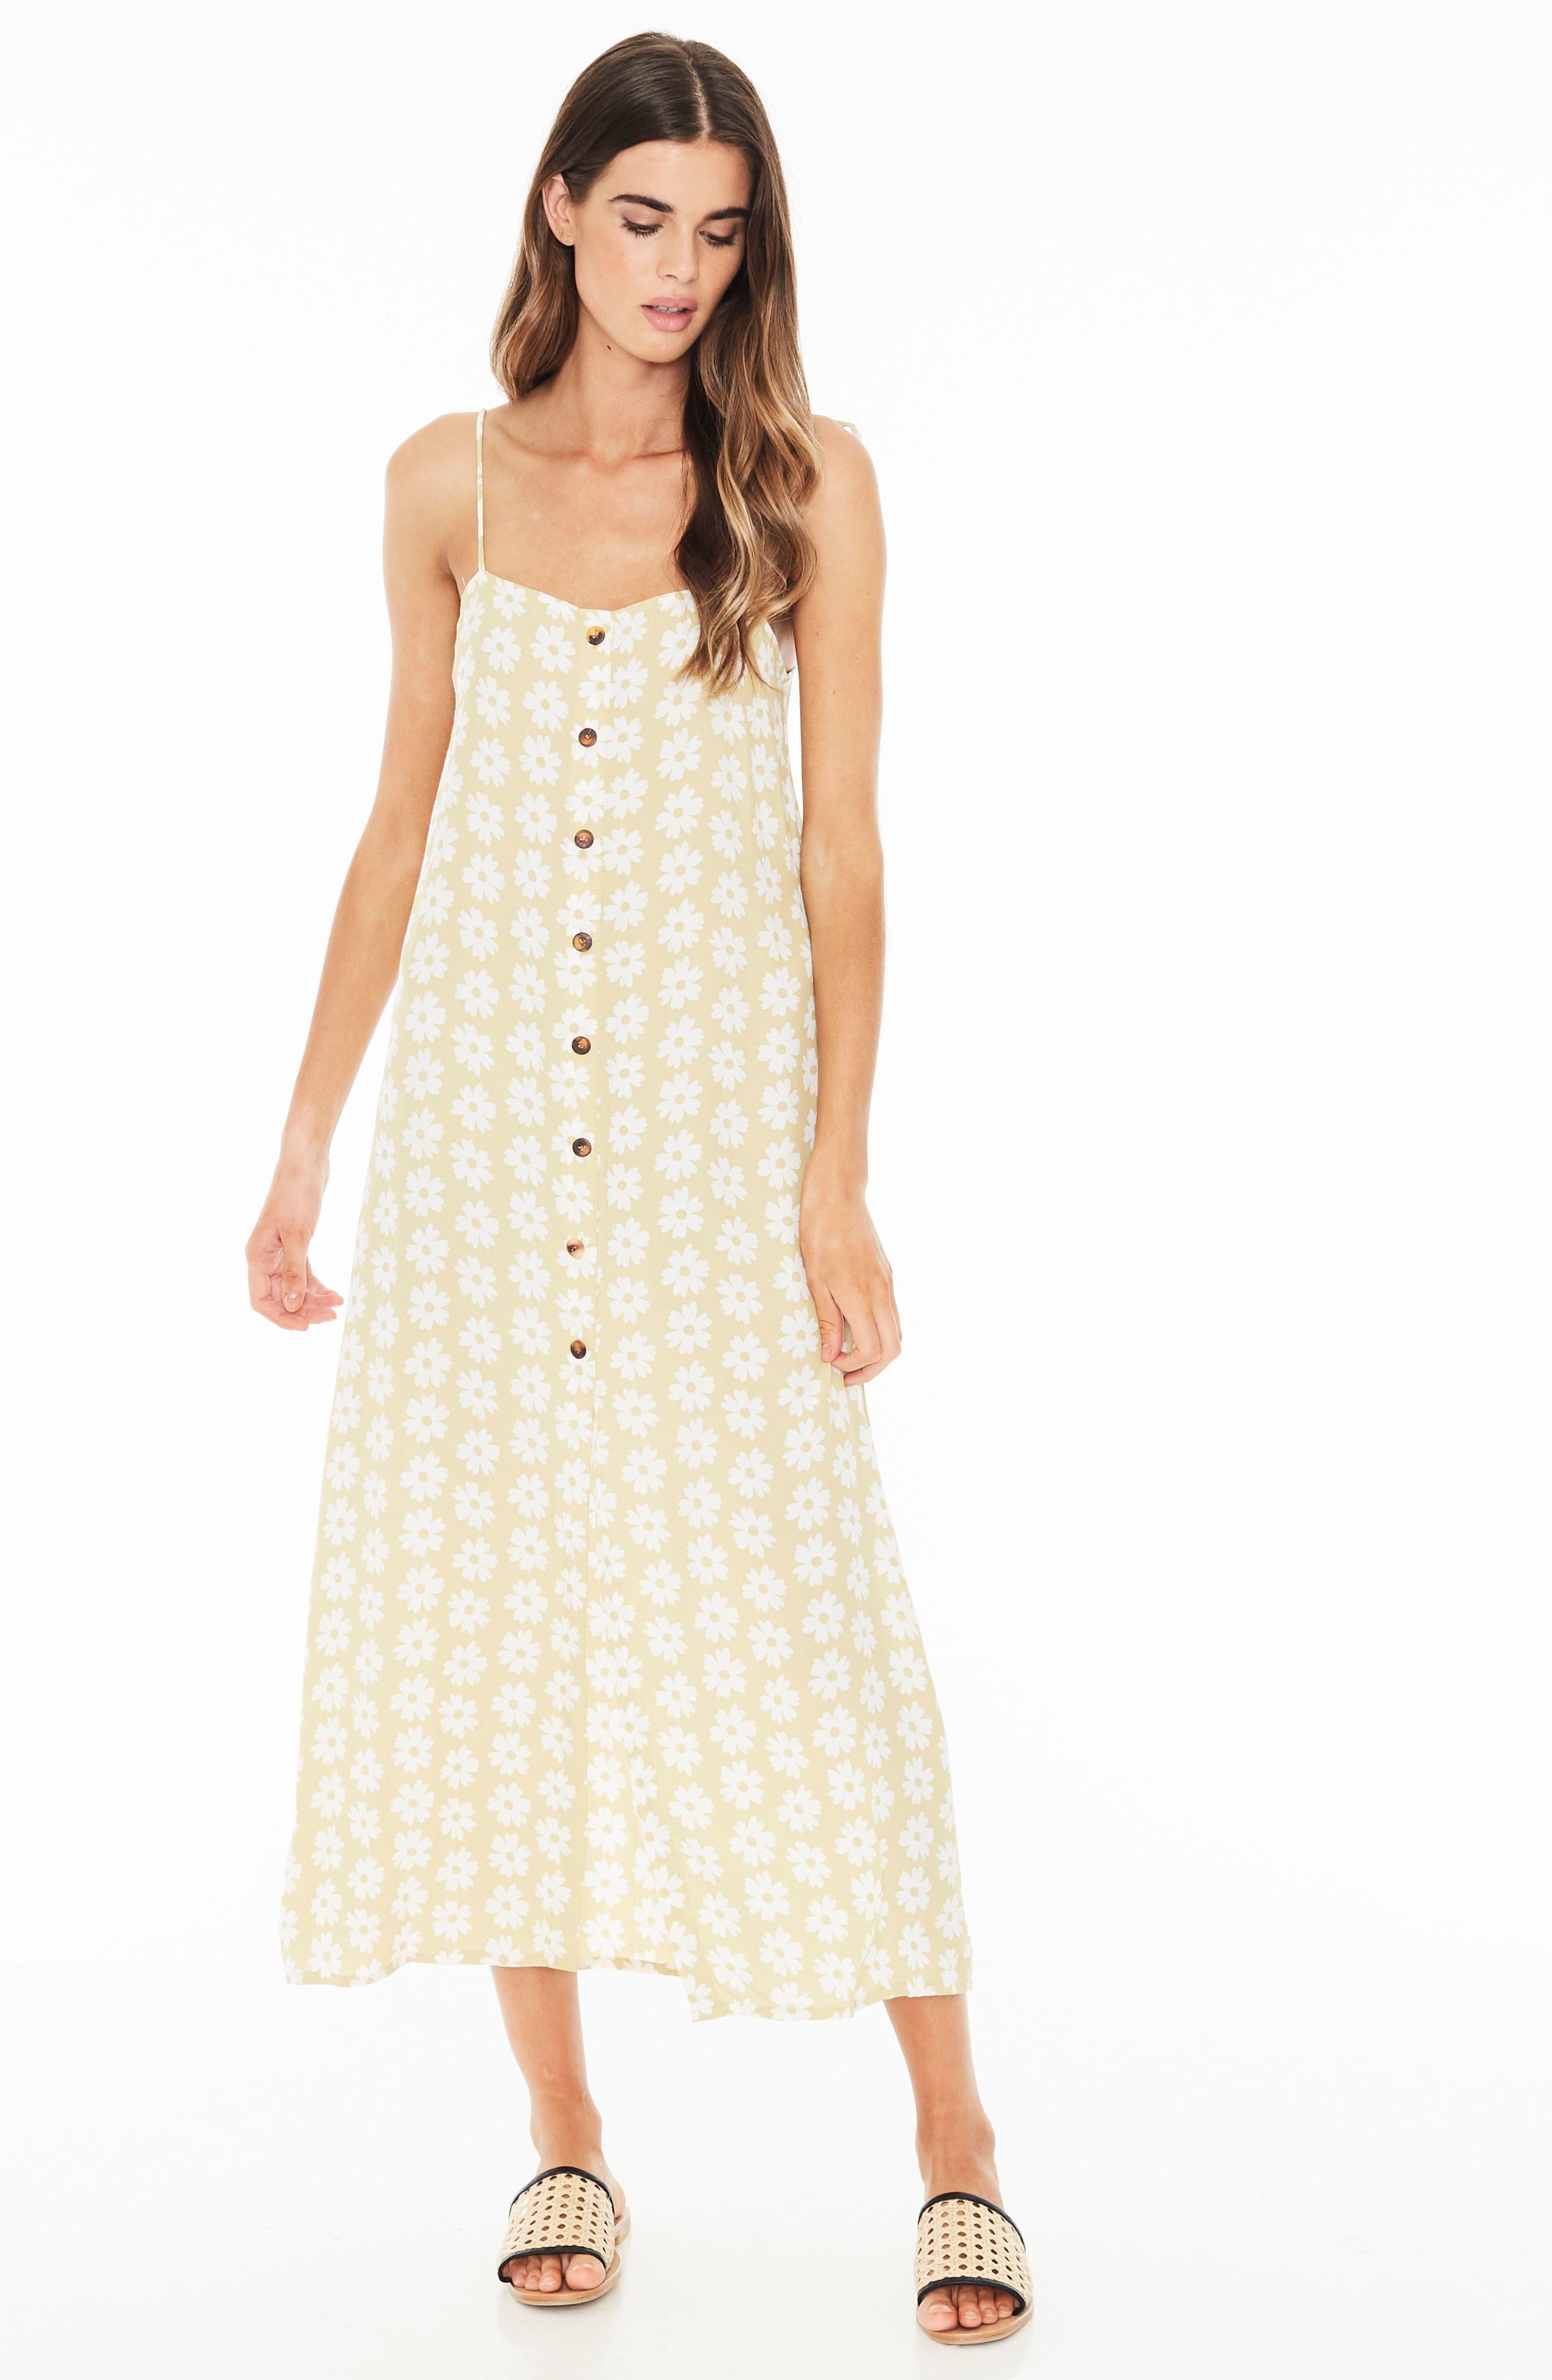 Arrieta Midi Dress,                         Main,                         color, 701